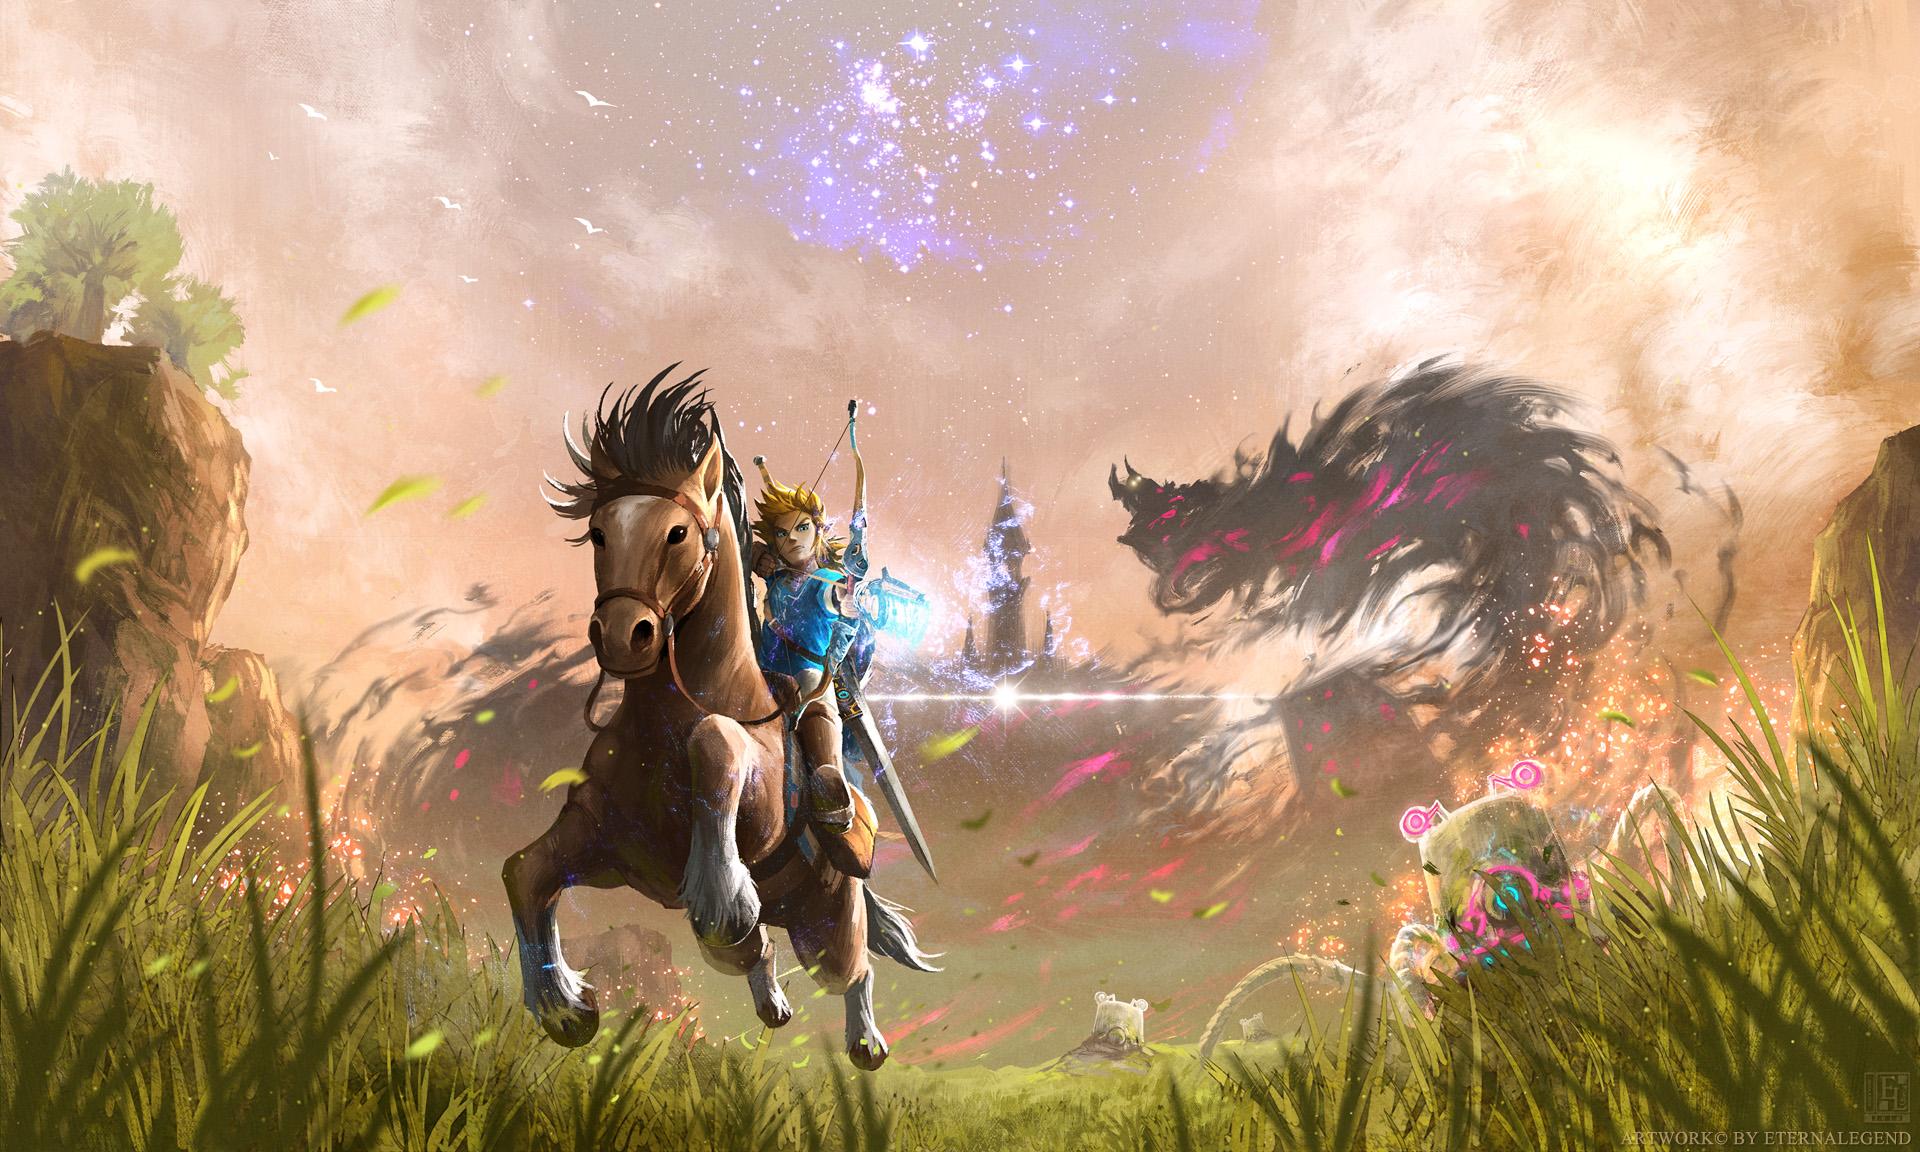 The Legend of Zelda Breath of the Wild Setup Free Download